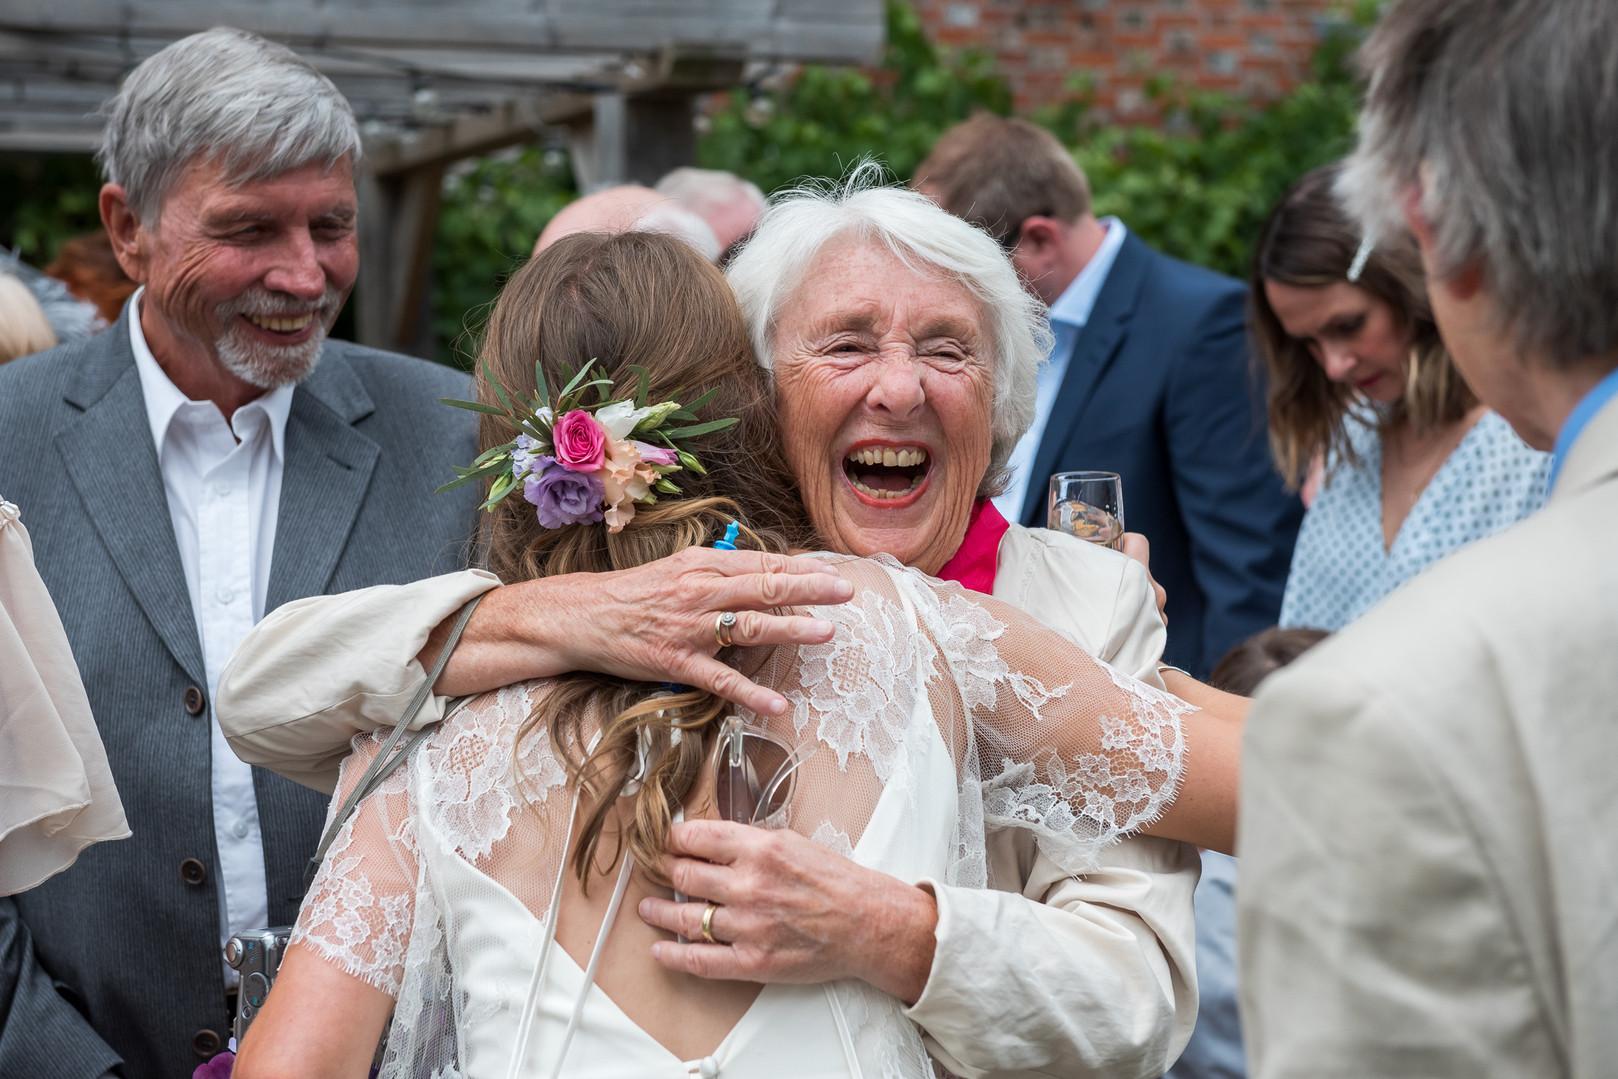 Happy smiling wedding guest